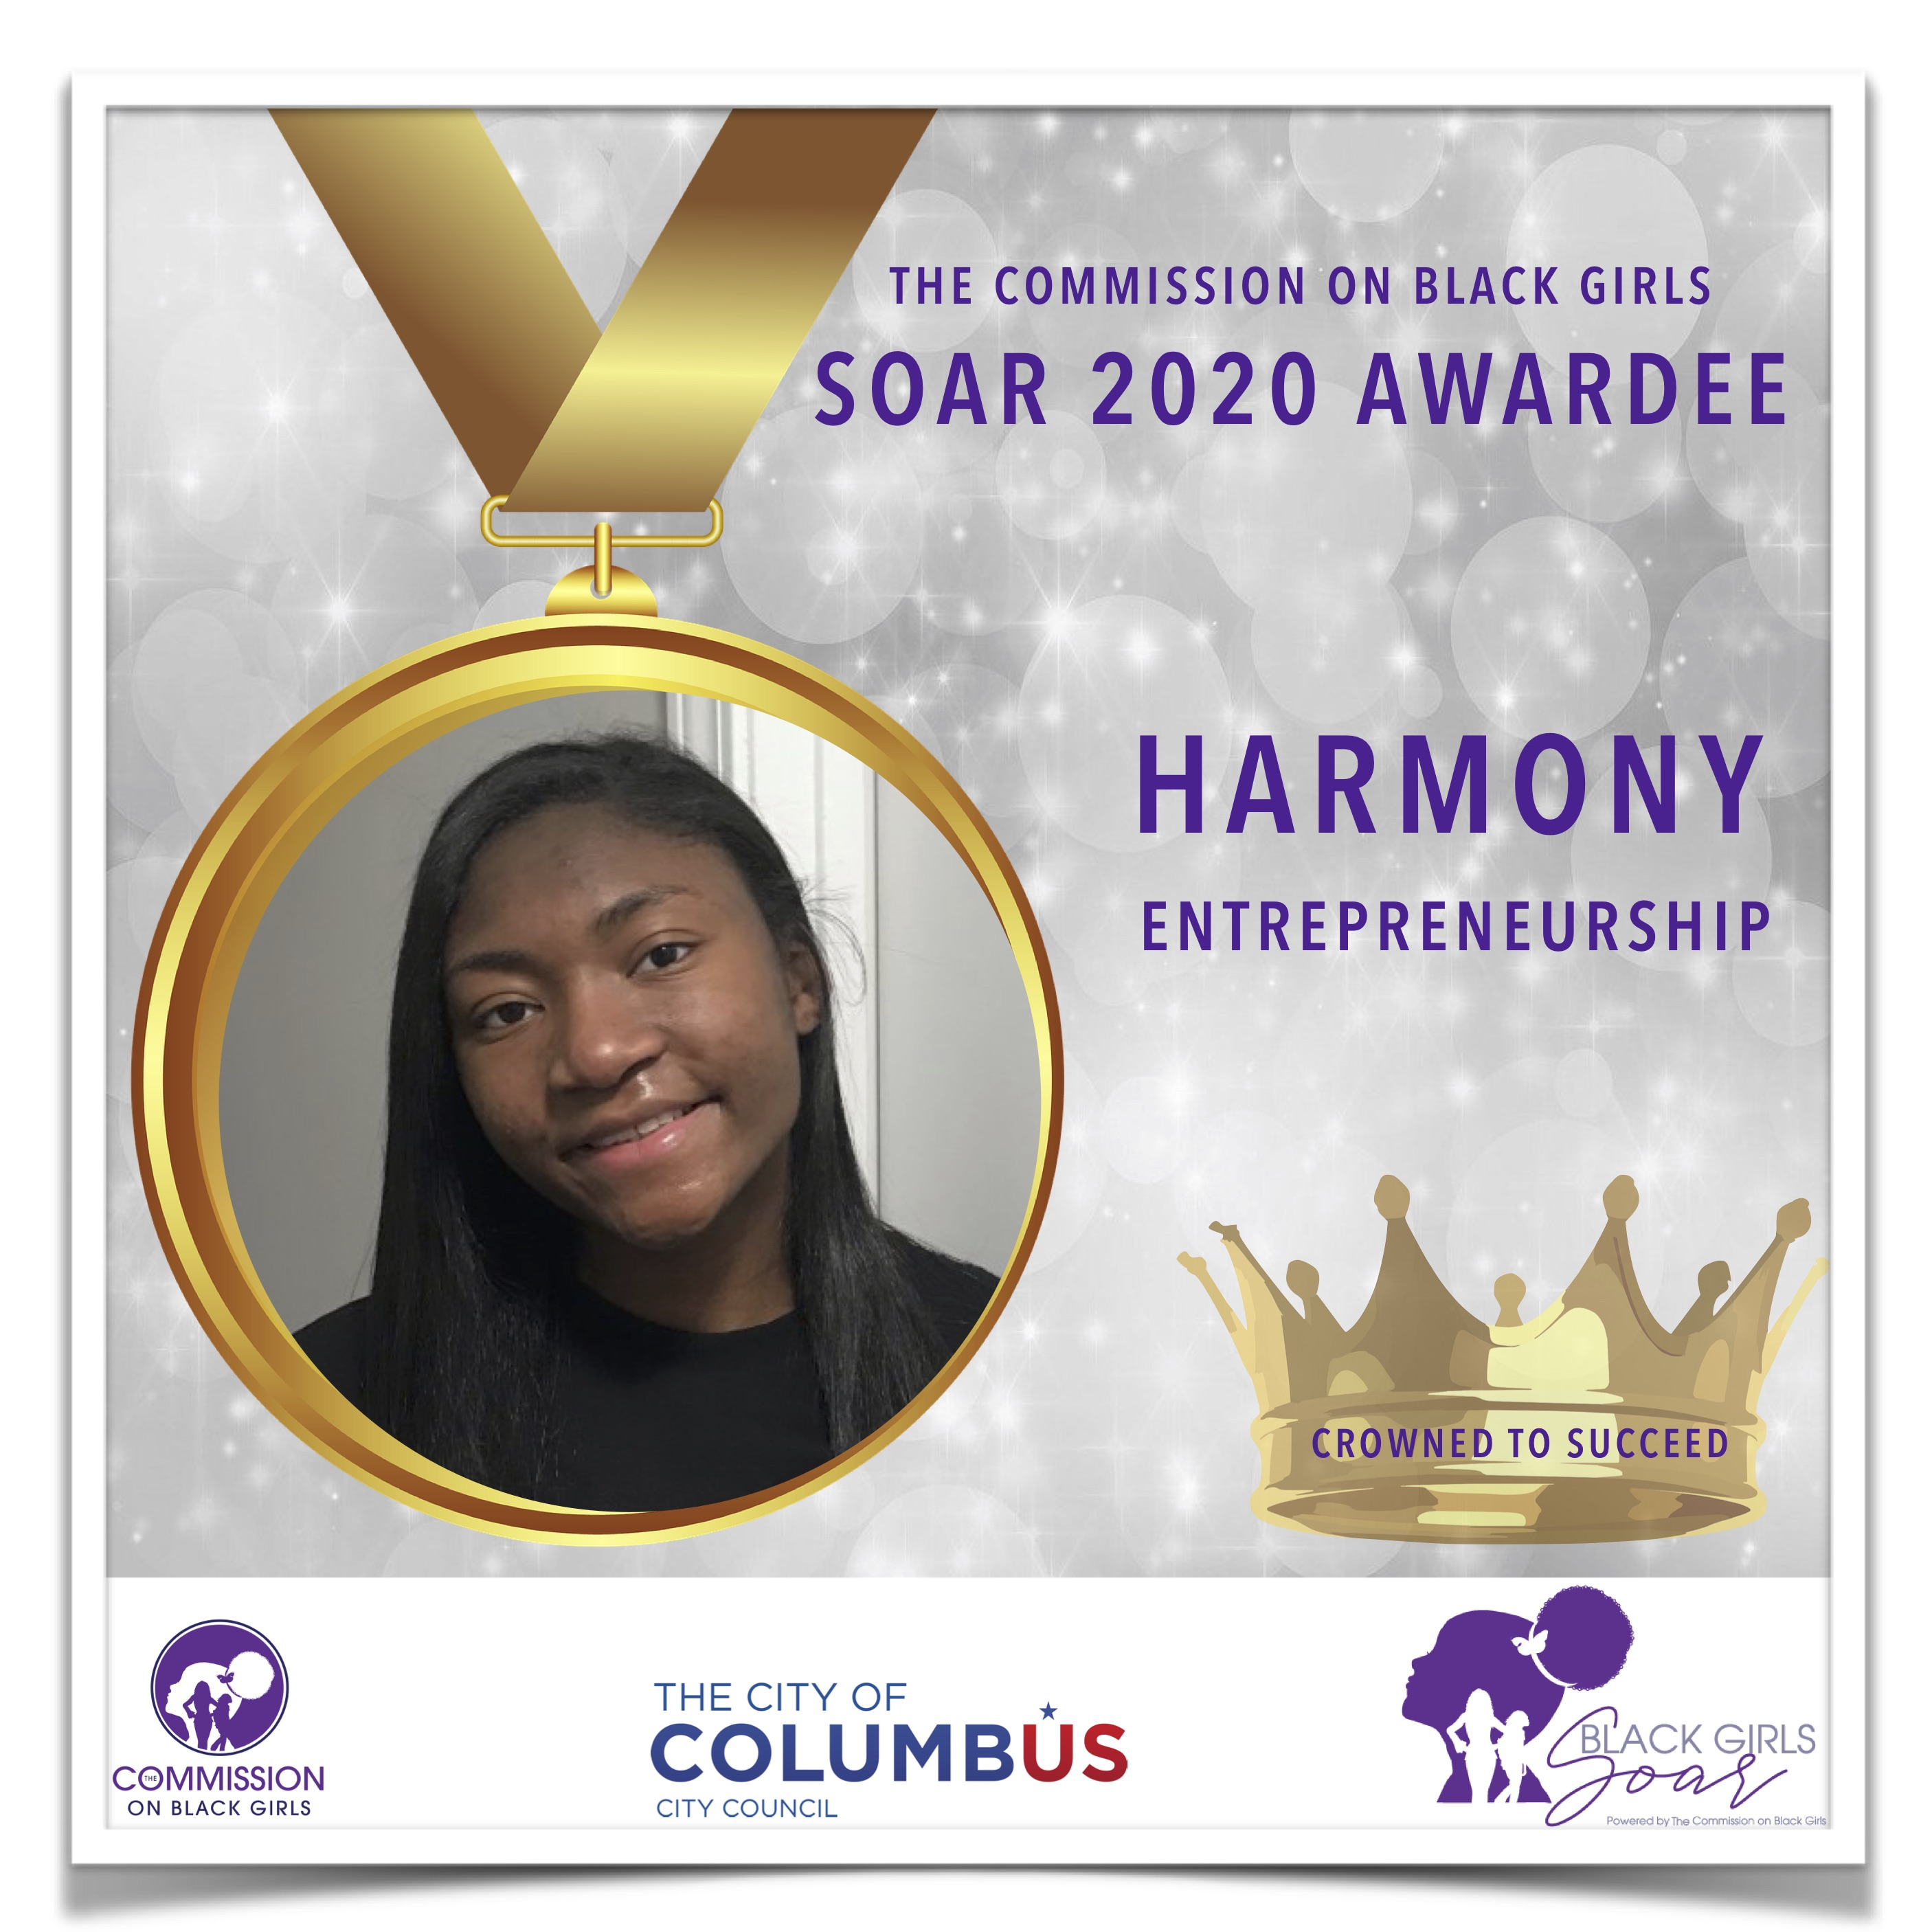 9 SOAR 2020 Harmony Entrepreneurship